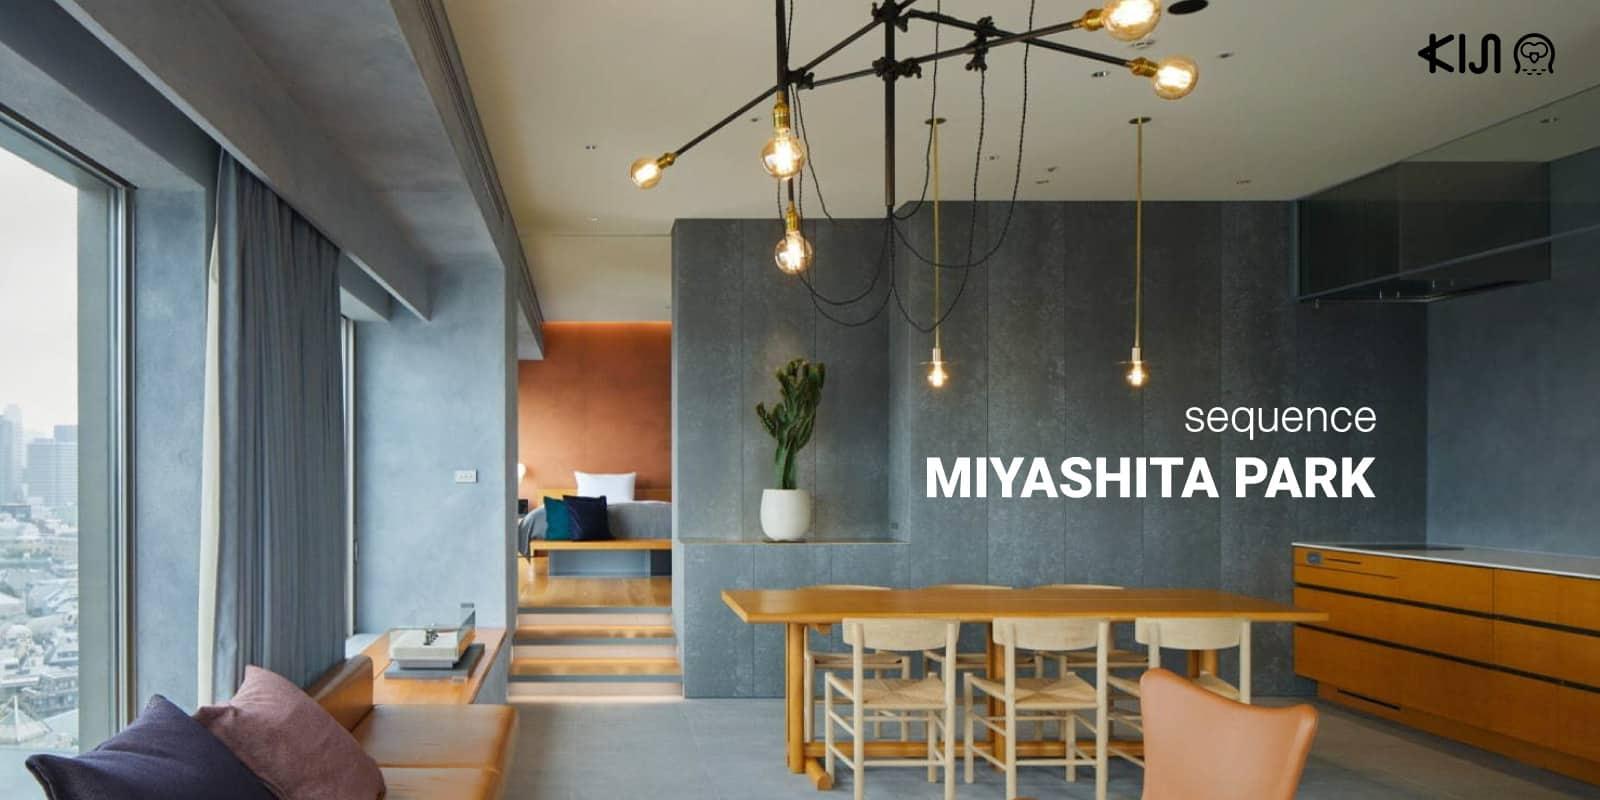 sequence MIYASHITA PARK ที่พักชิบูย่า